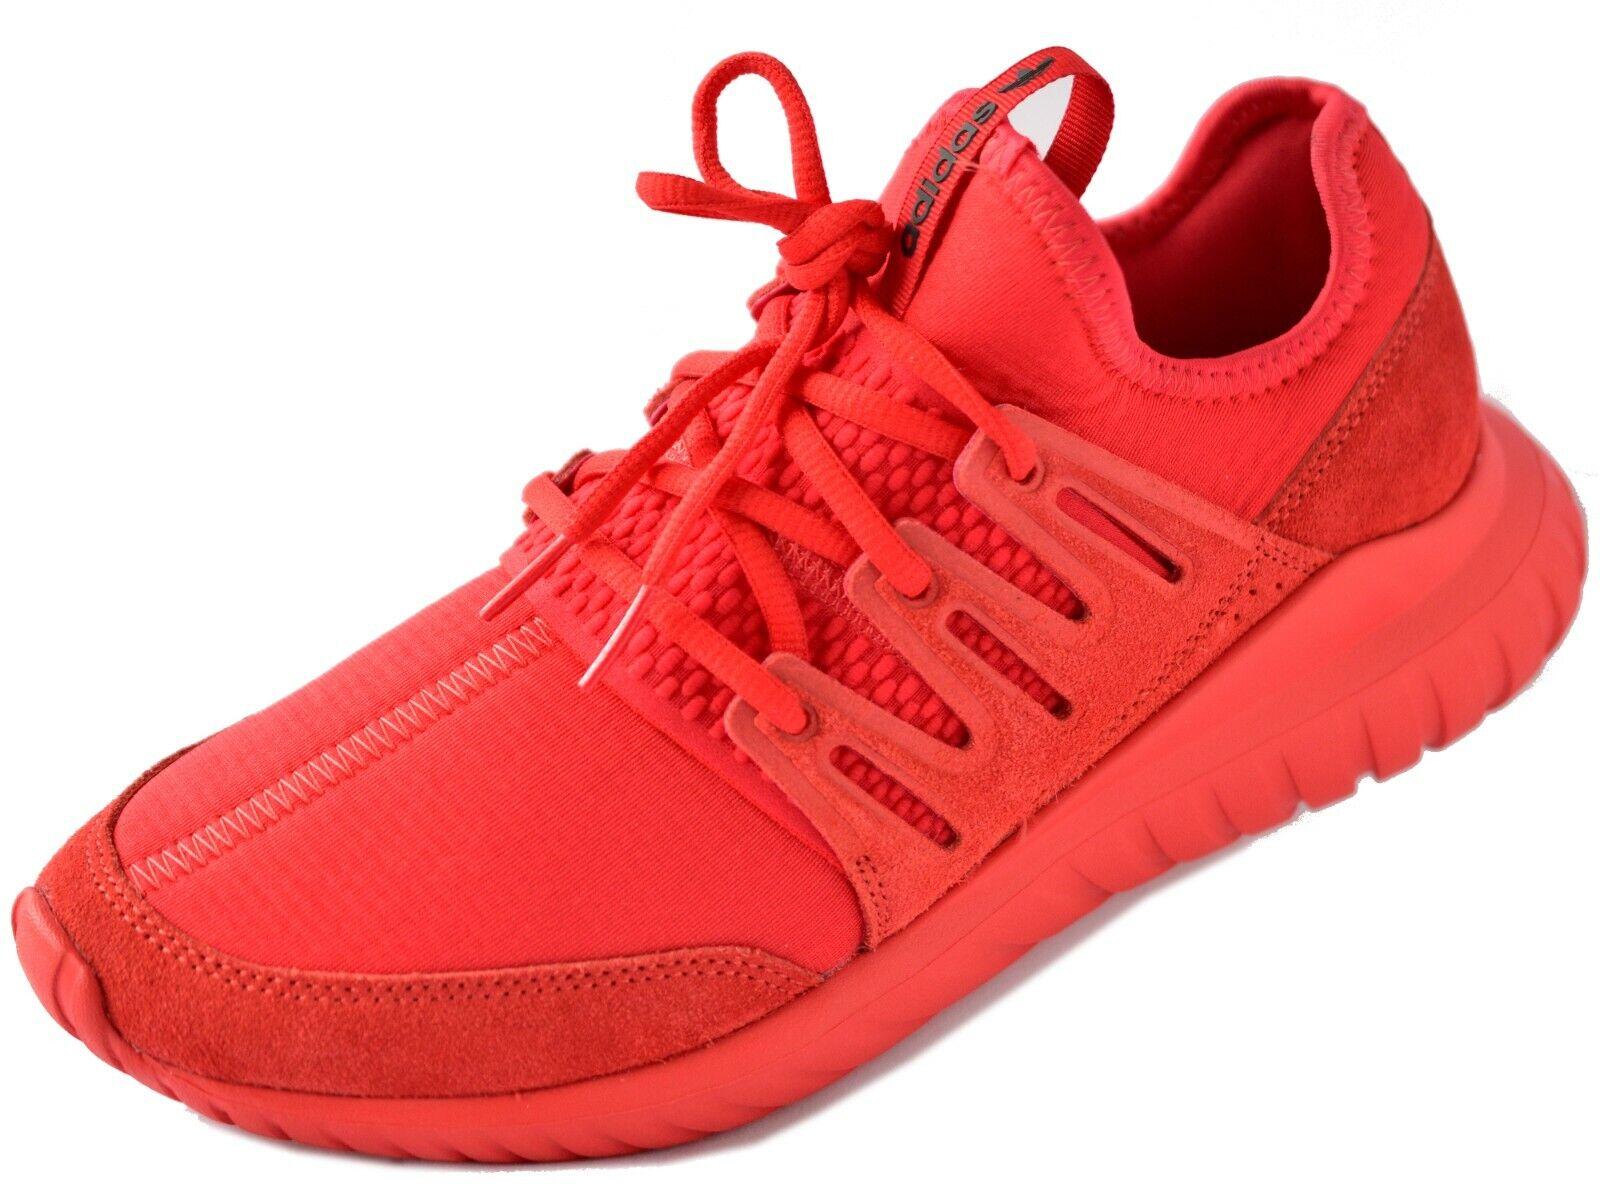 Adidas Originals Trainers Tubular Radial Mens damen Althletics schuhe UK Größe rot